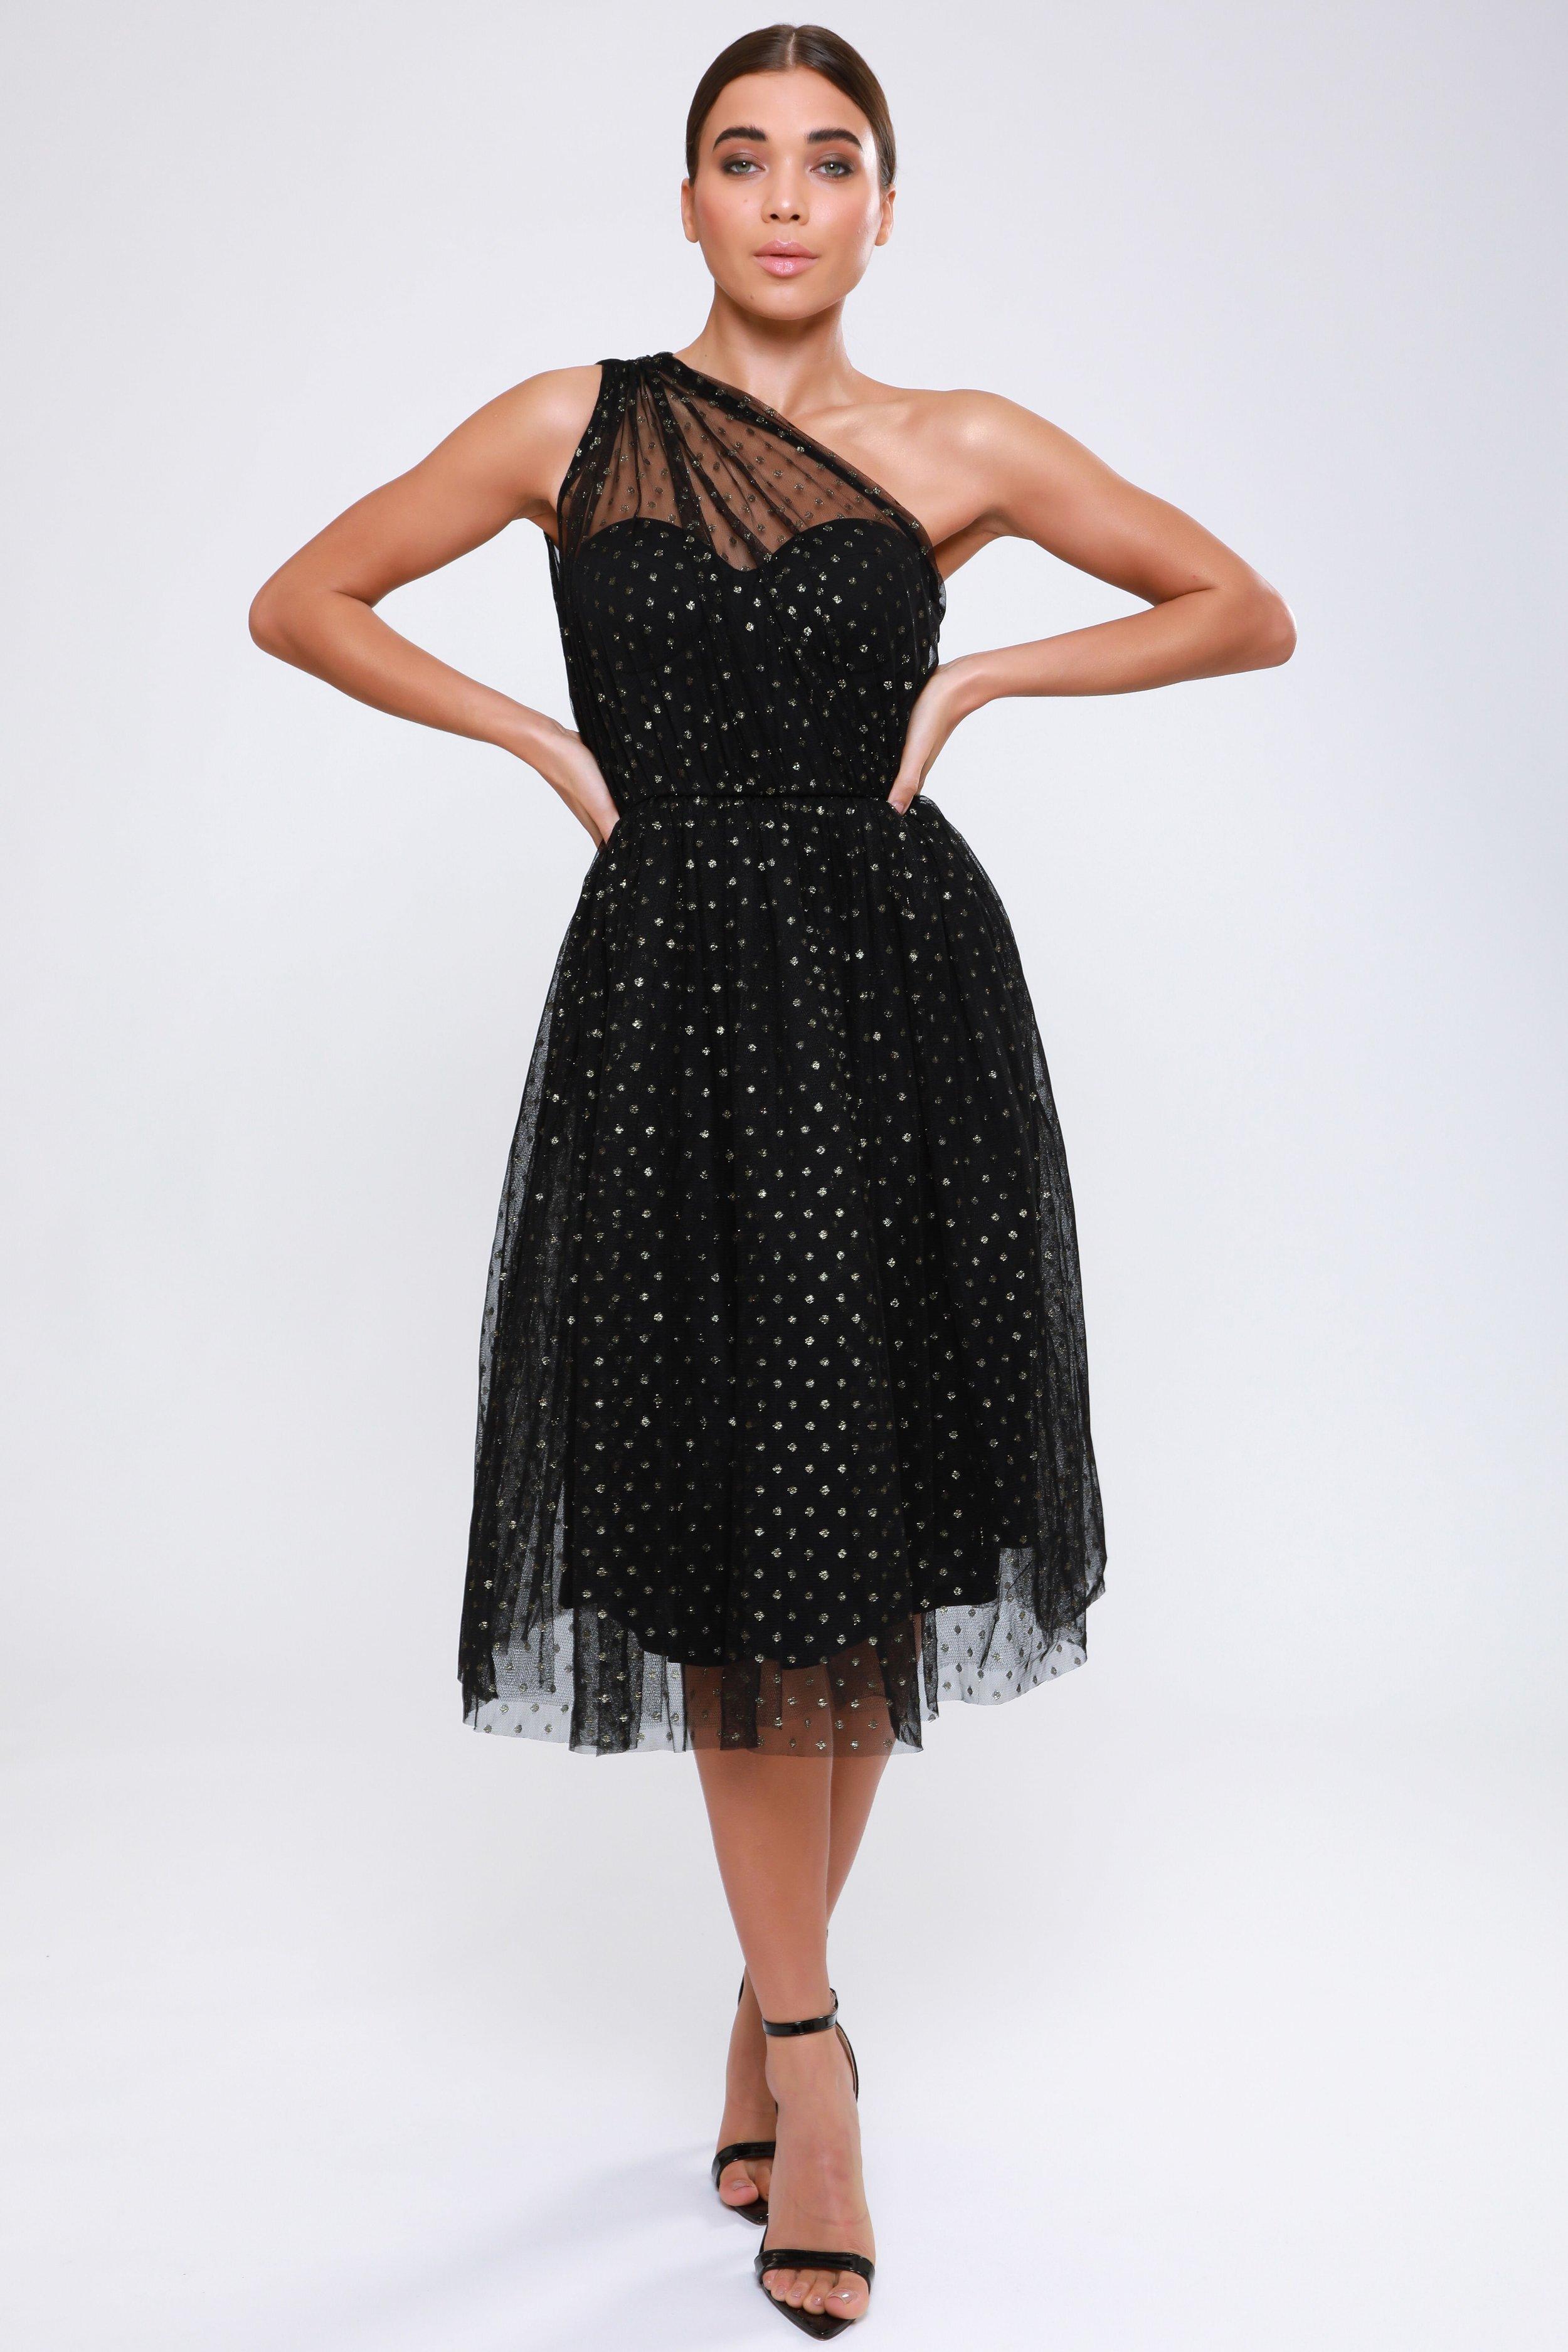 Mettalic Mesh  Asymmetric Tutu Dress   £65.00